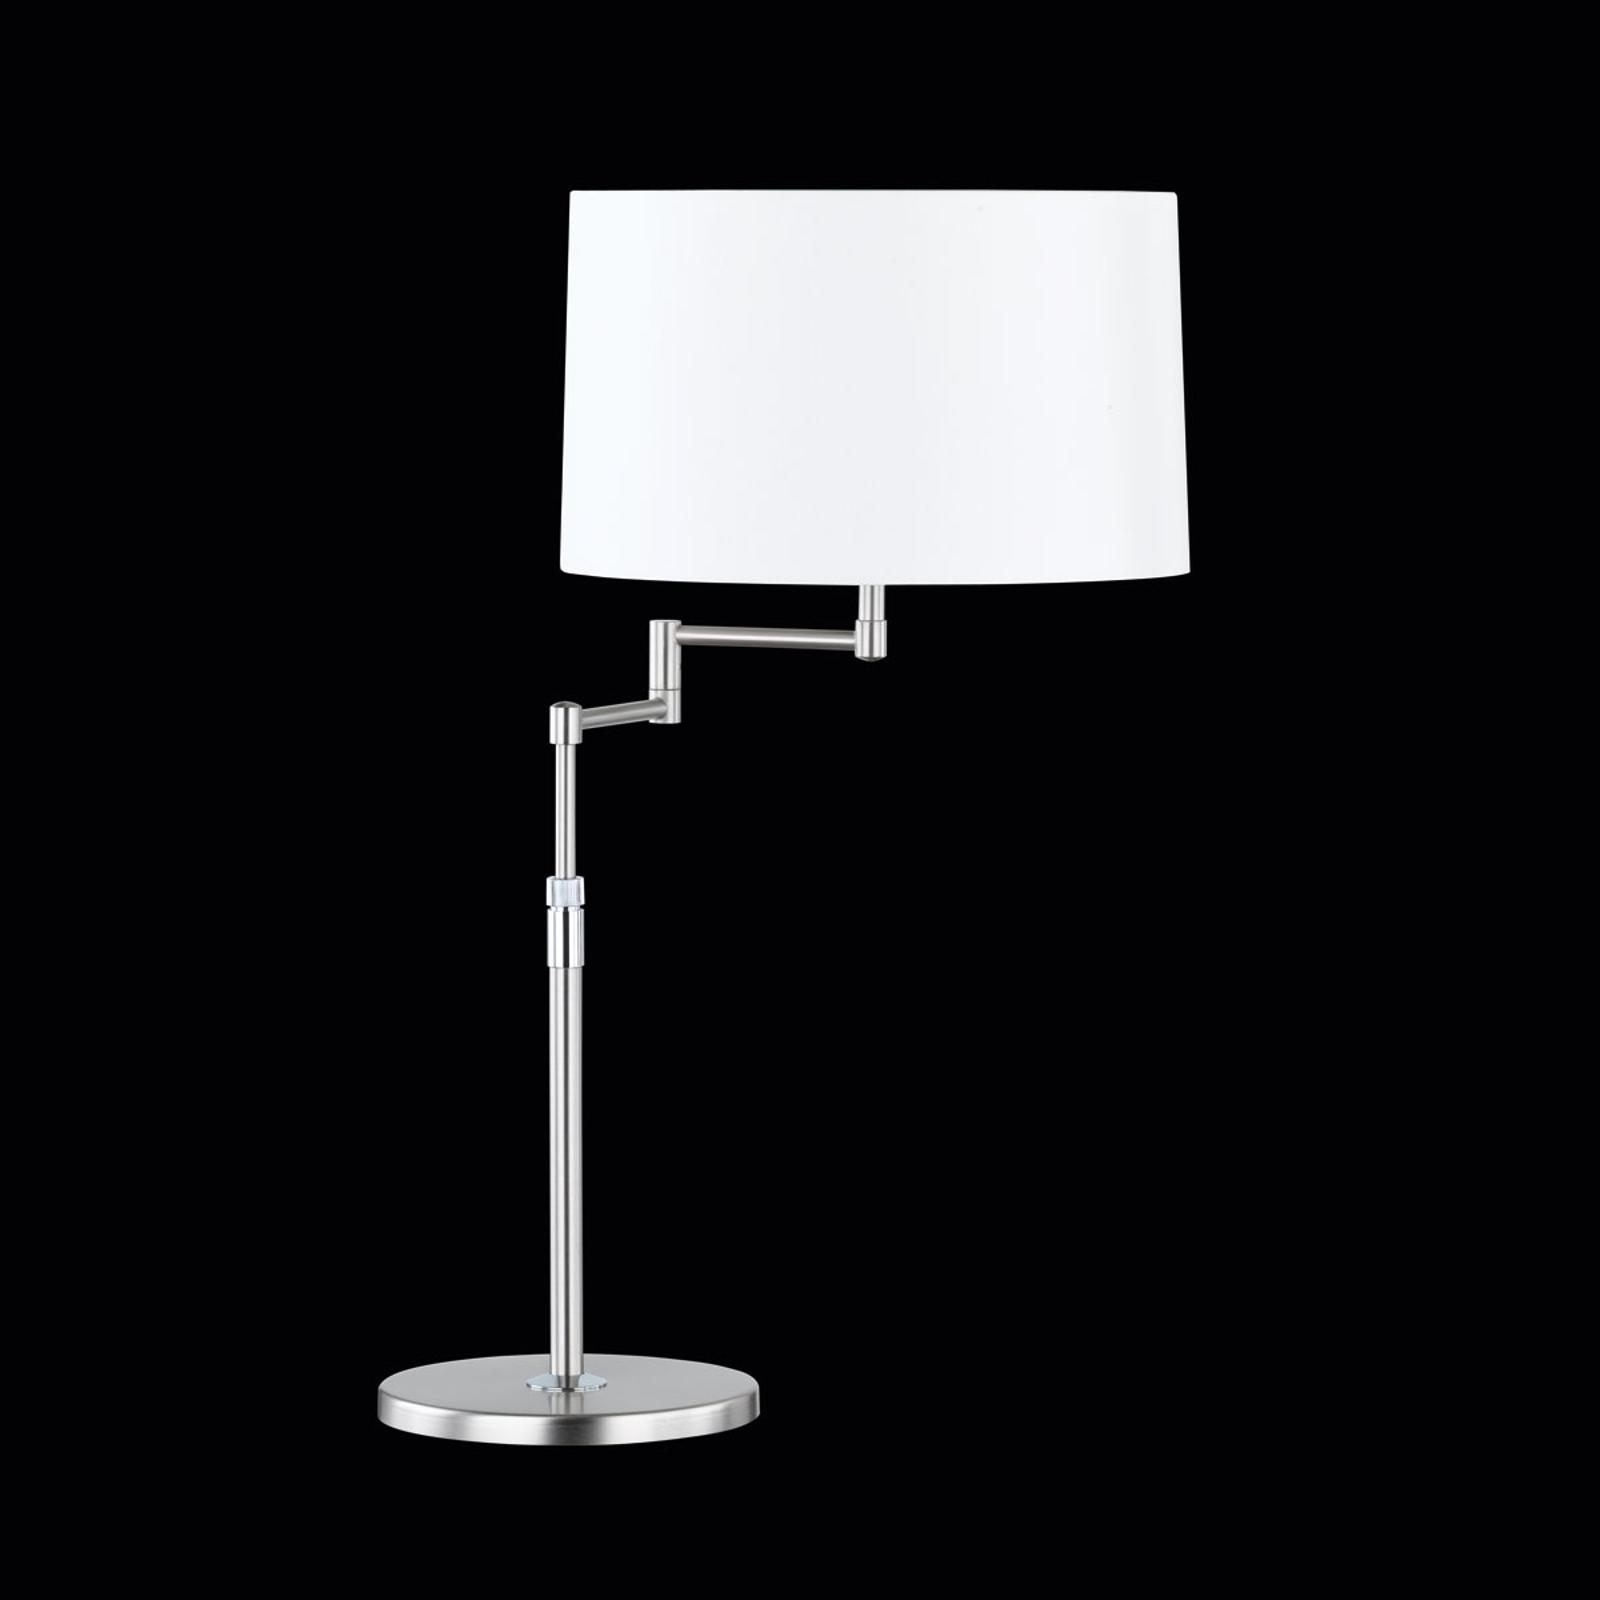 Lampa stołowa LOOP z abażurem